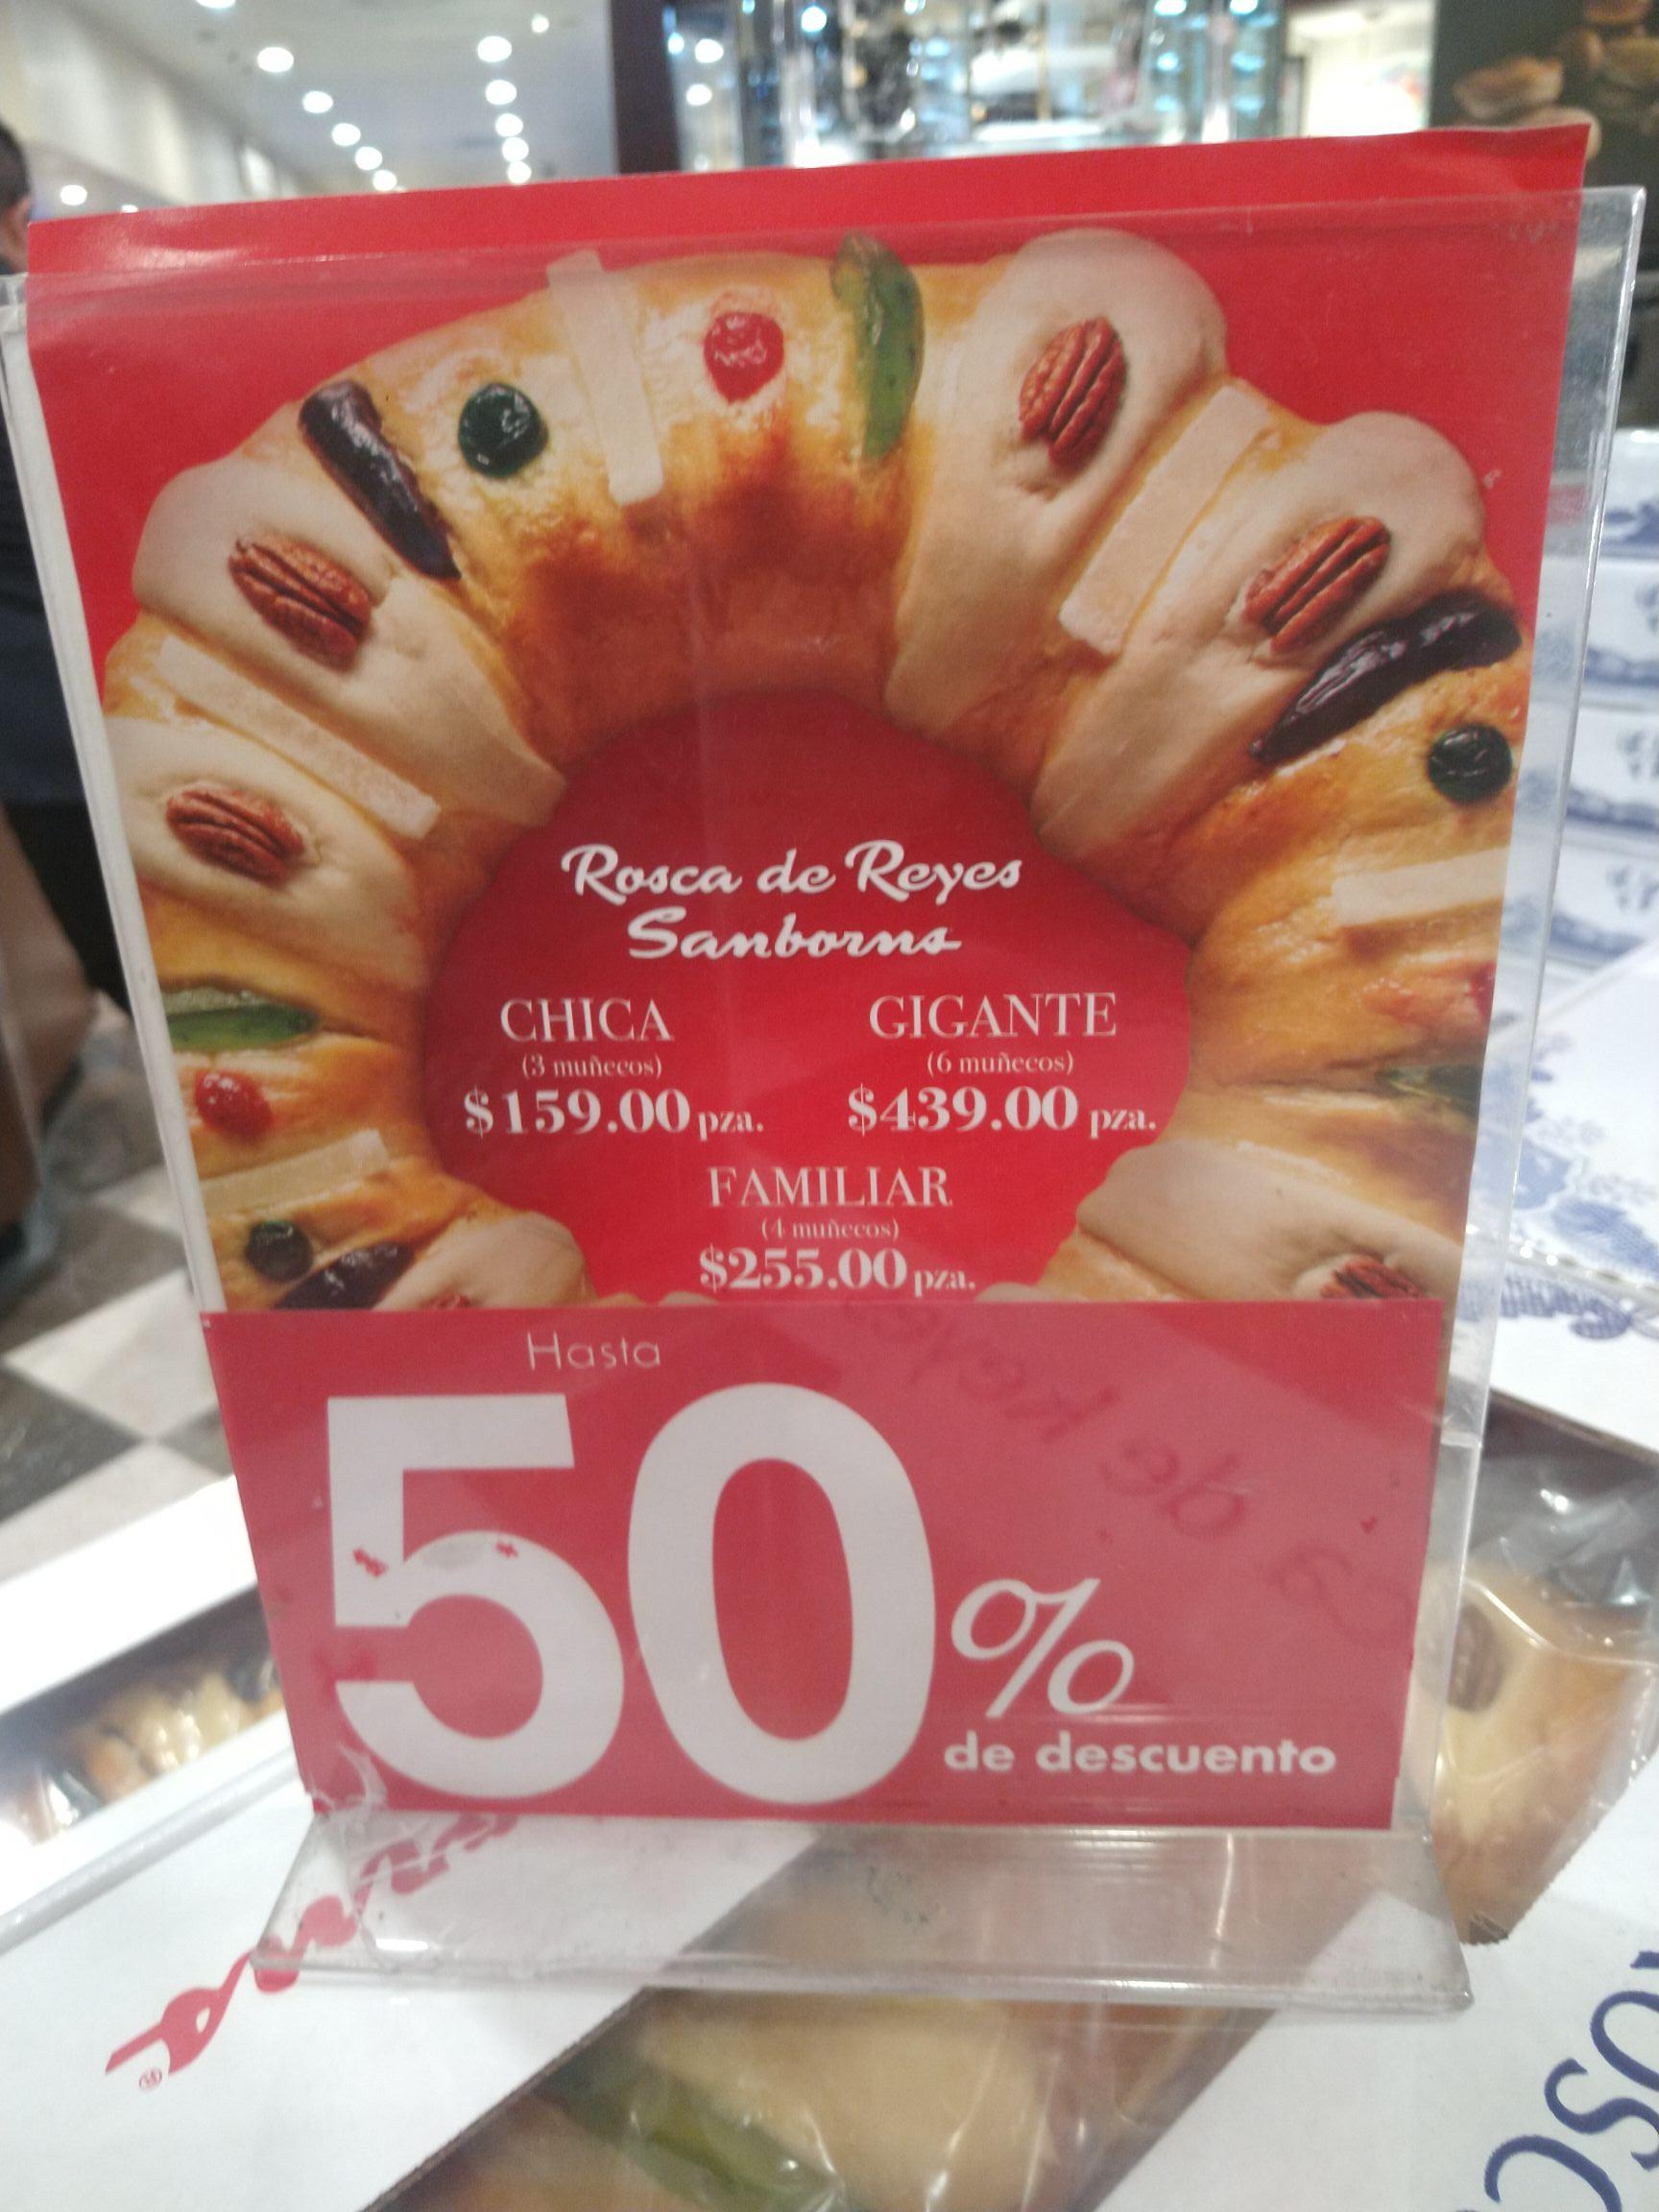 Rosca de Reyes Sanborns